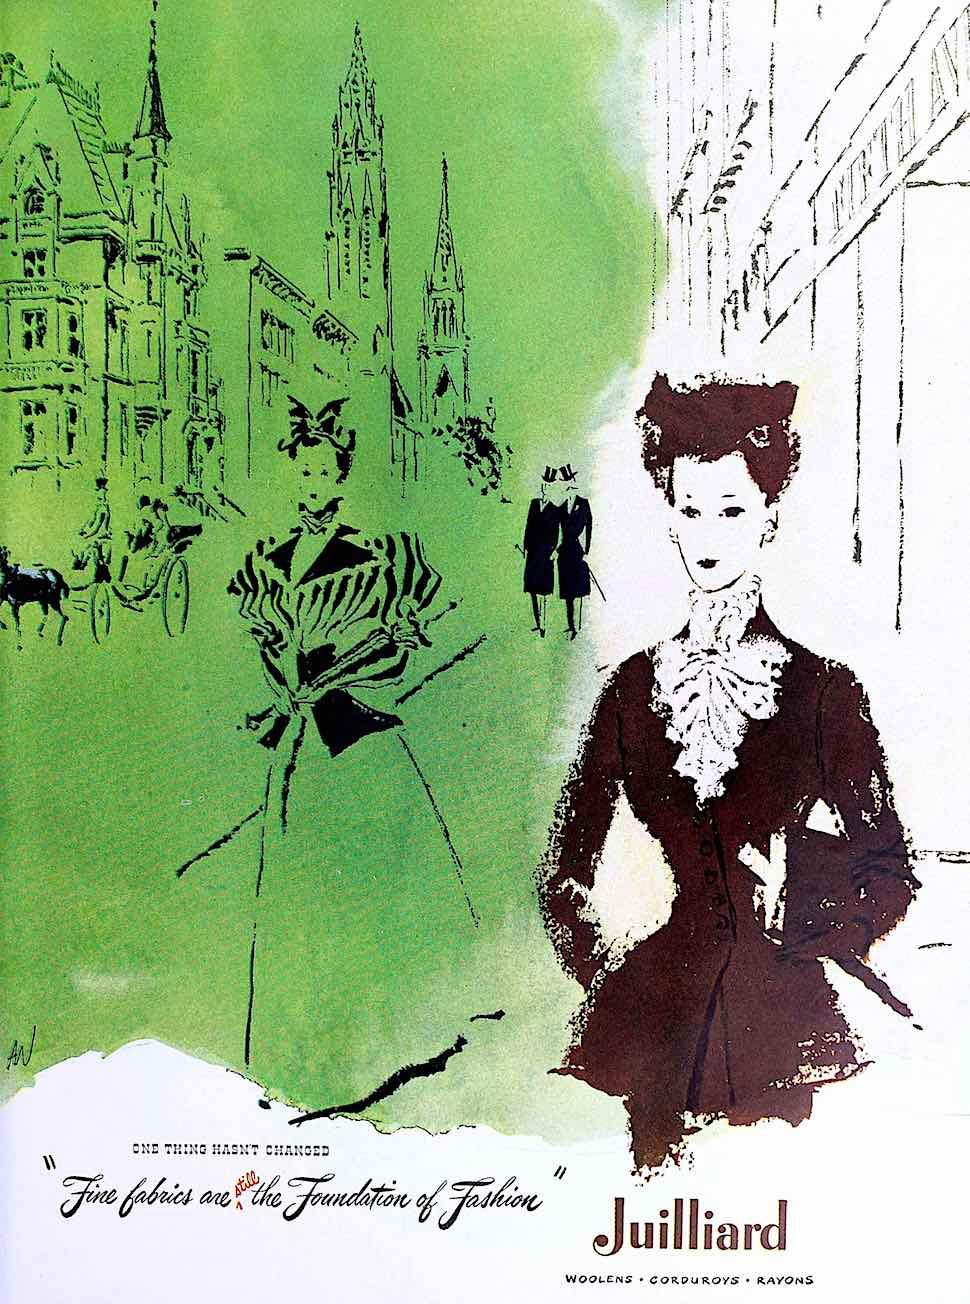 a 1948 fashion illustration in green for Julliard Fabrics